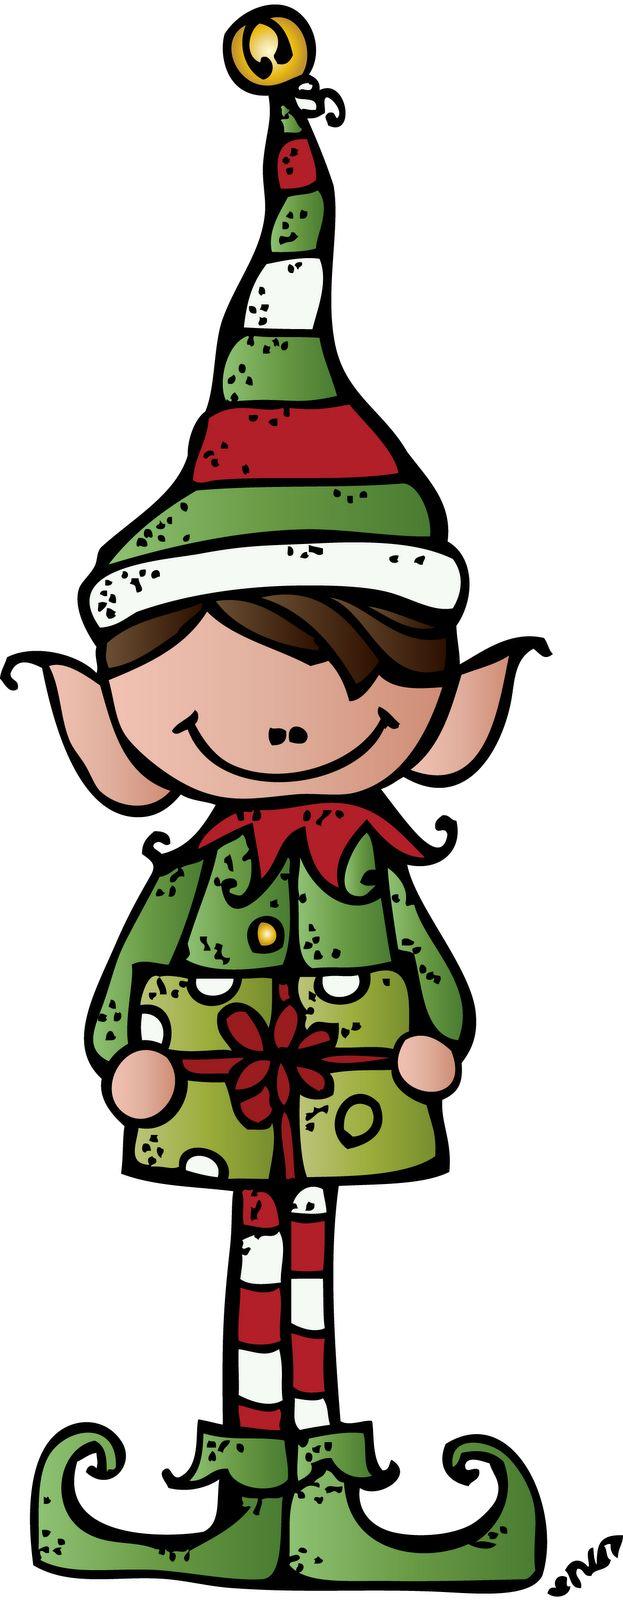 Naptime clipart elf. Free download clip art